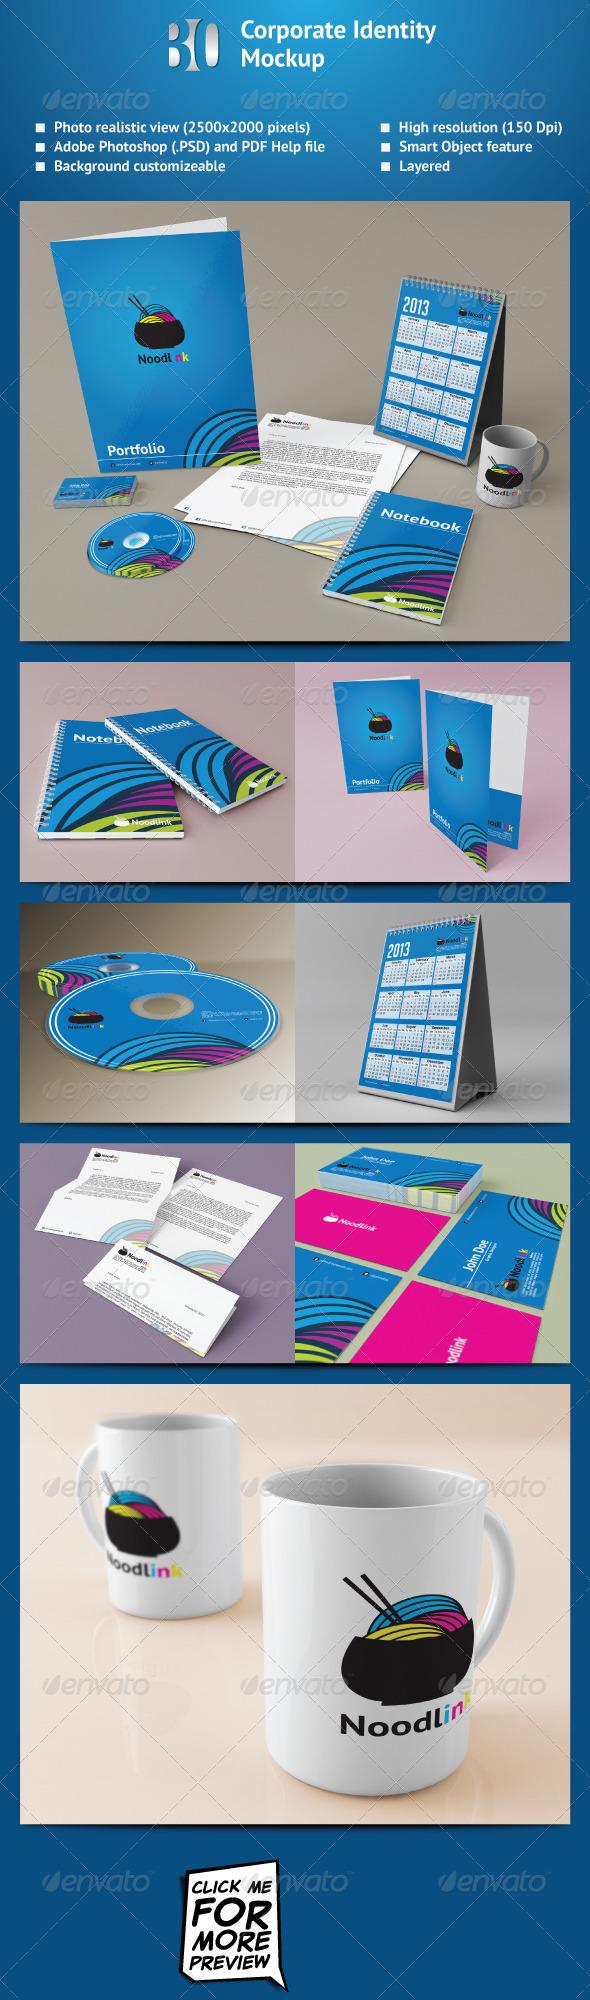 GraphicRiver Corporate Identity Mockup 2830488